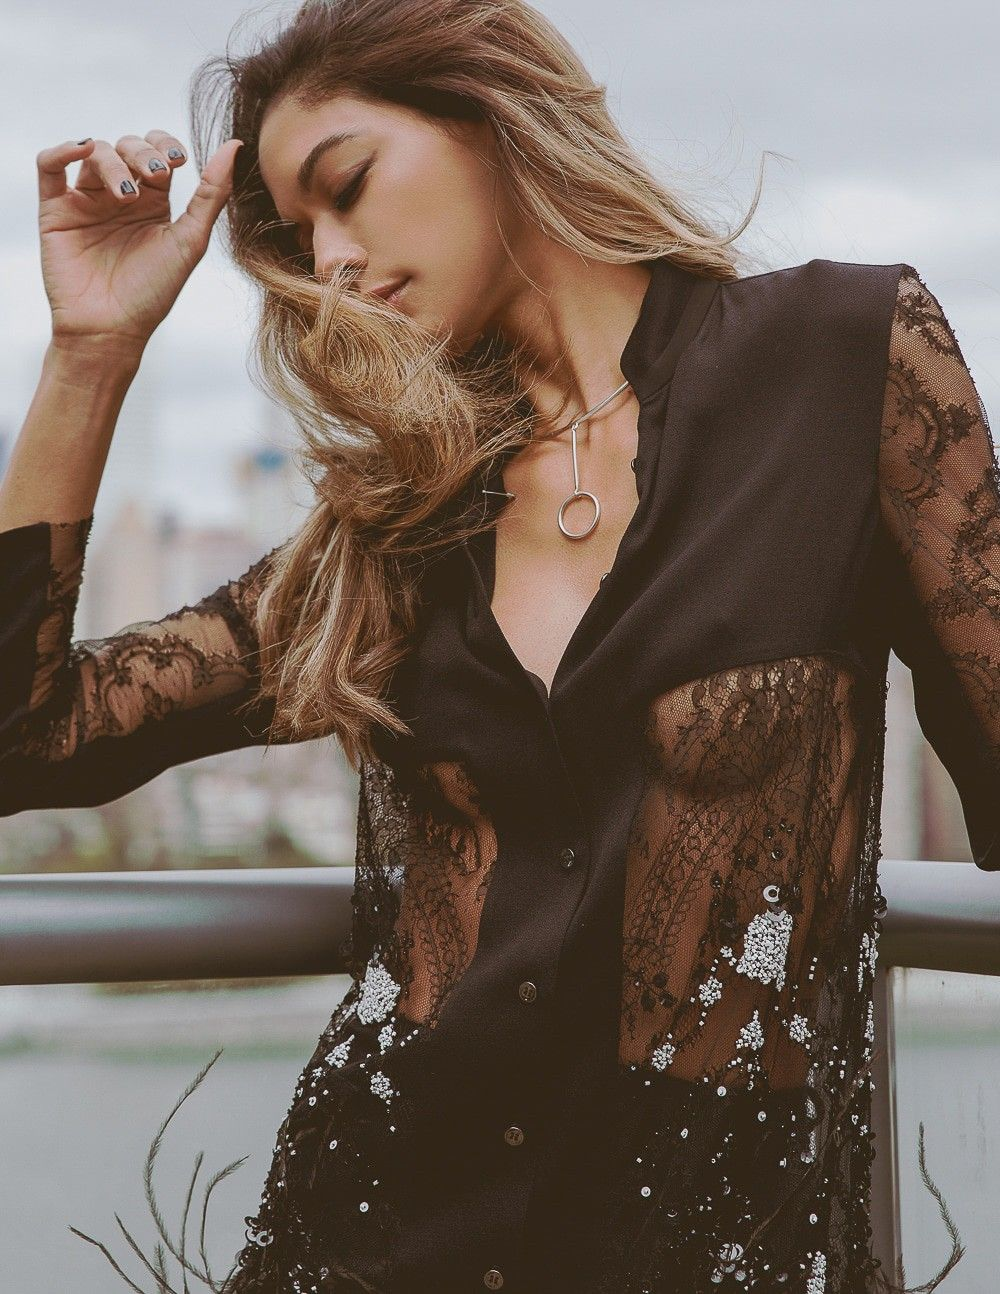 Heidy De la Rosa models street fashion for Grazia Slovenia